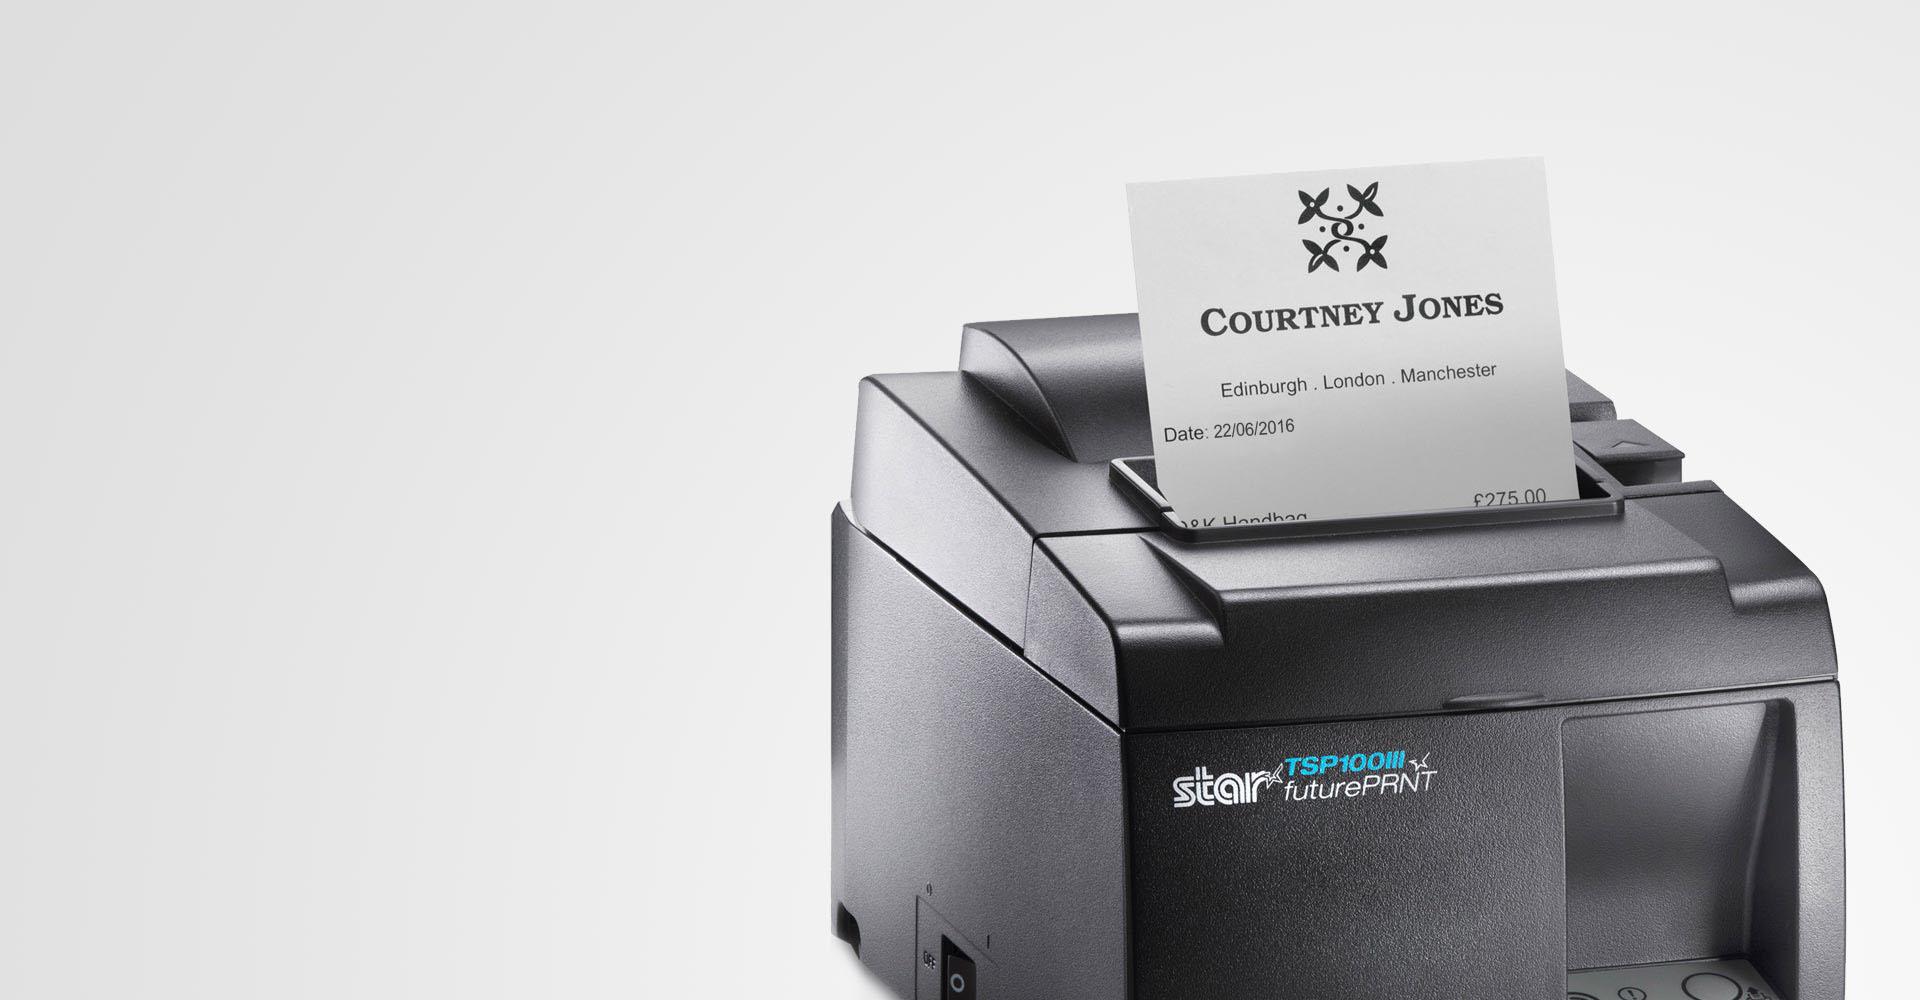 Impresora de tickets TSP100